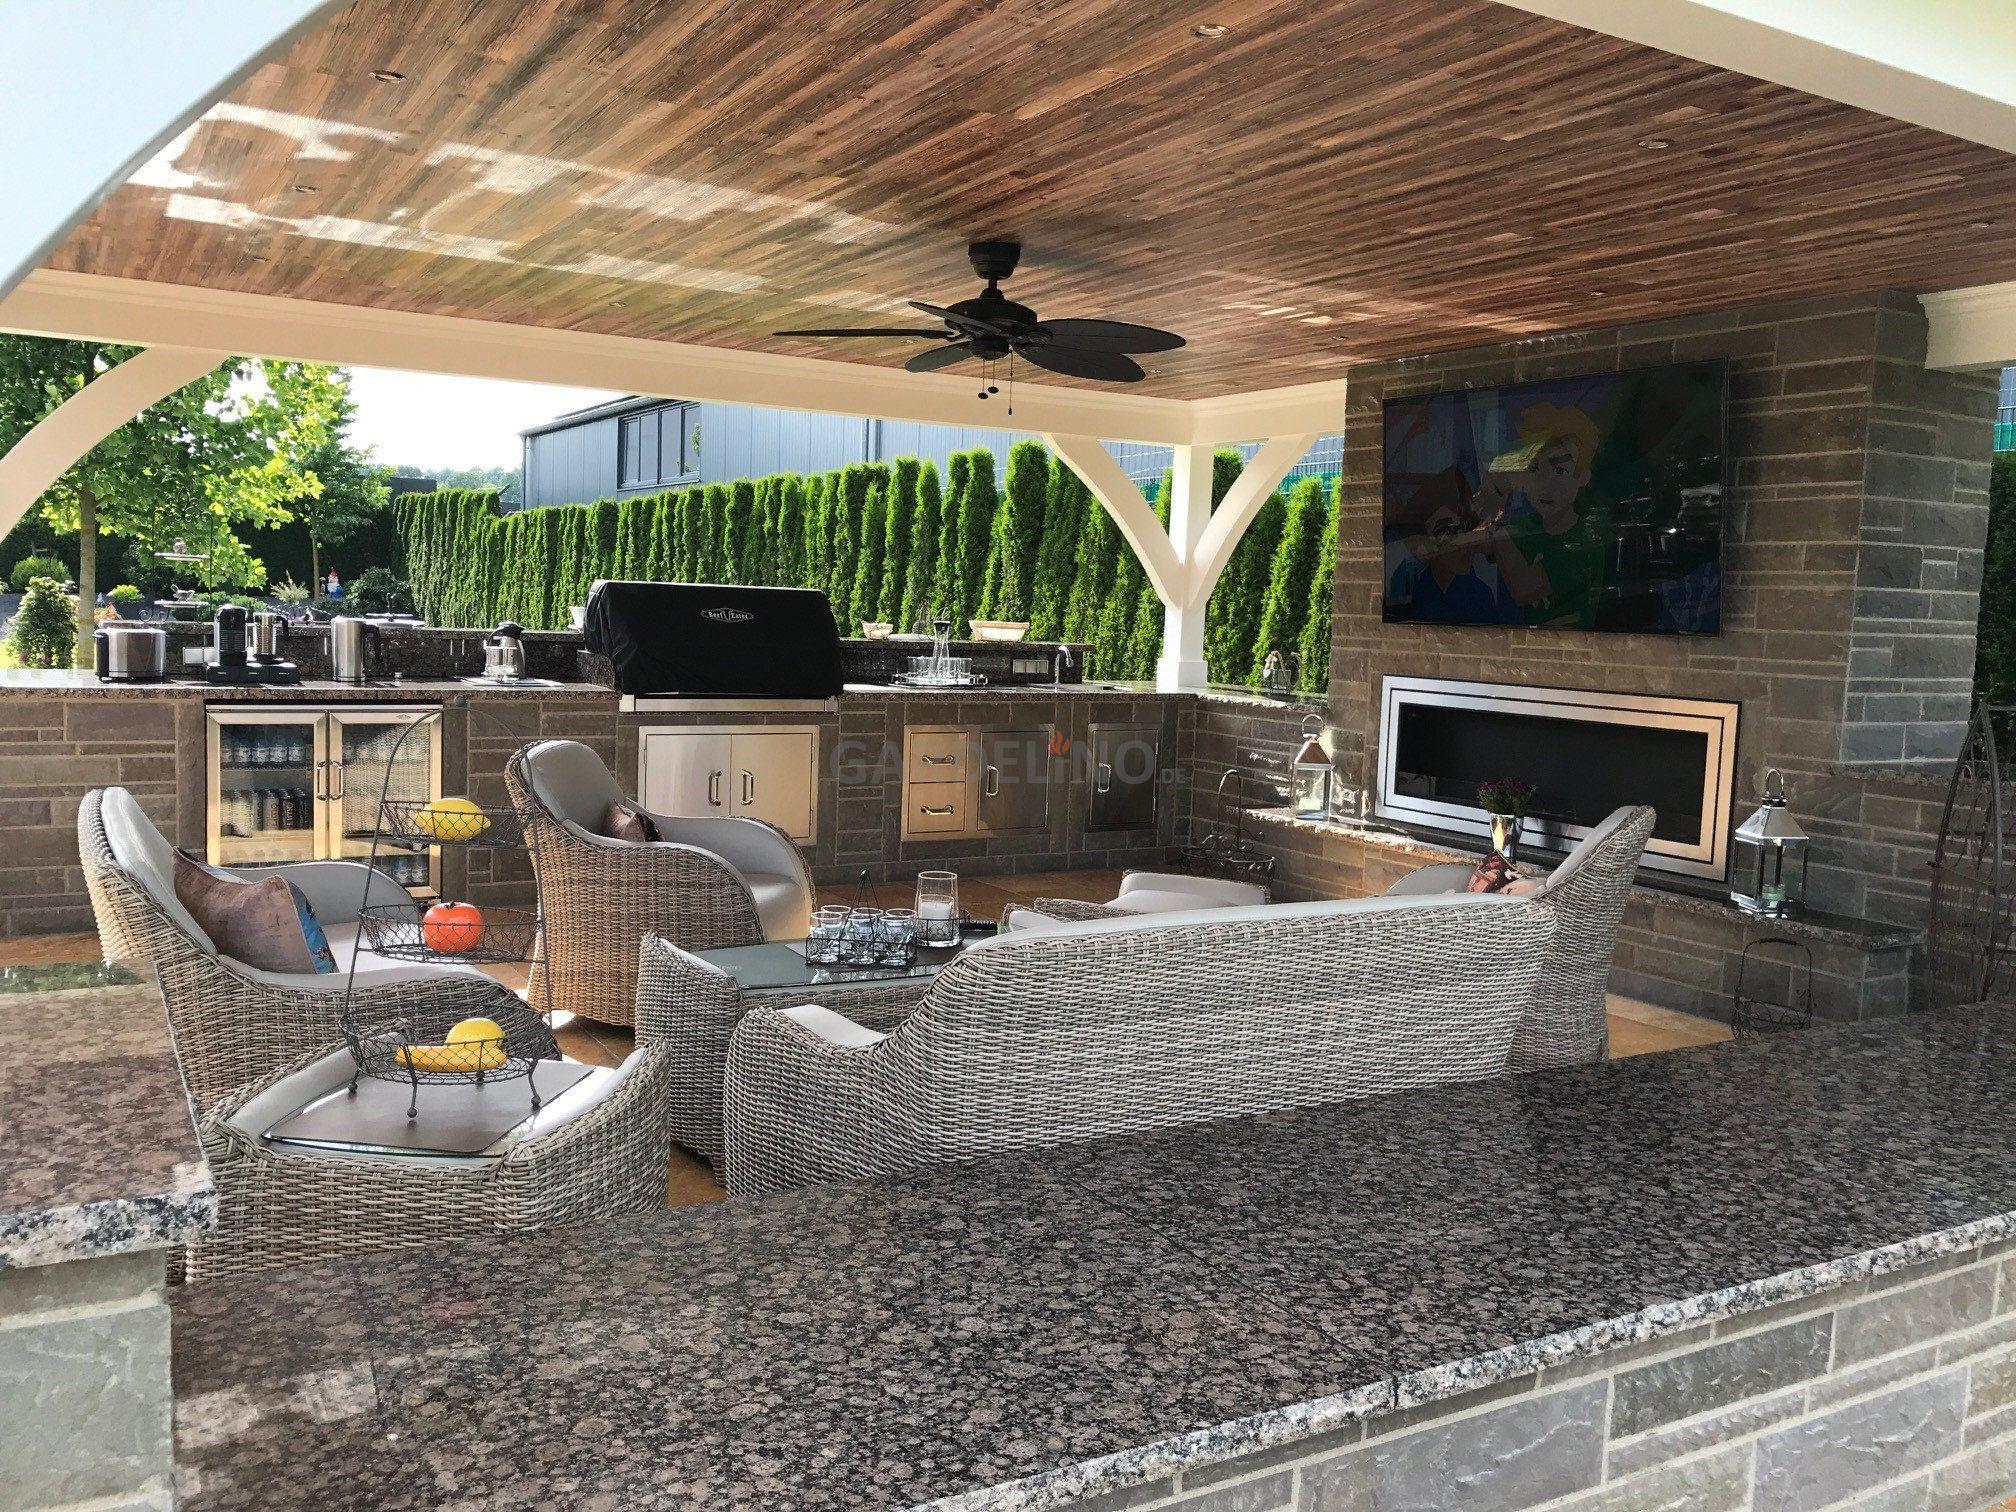 Outdoor Küche Reihenhaus : Luxus outdoorküche mit beefeater grill joko domus teppanyaki grill